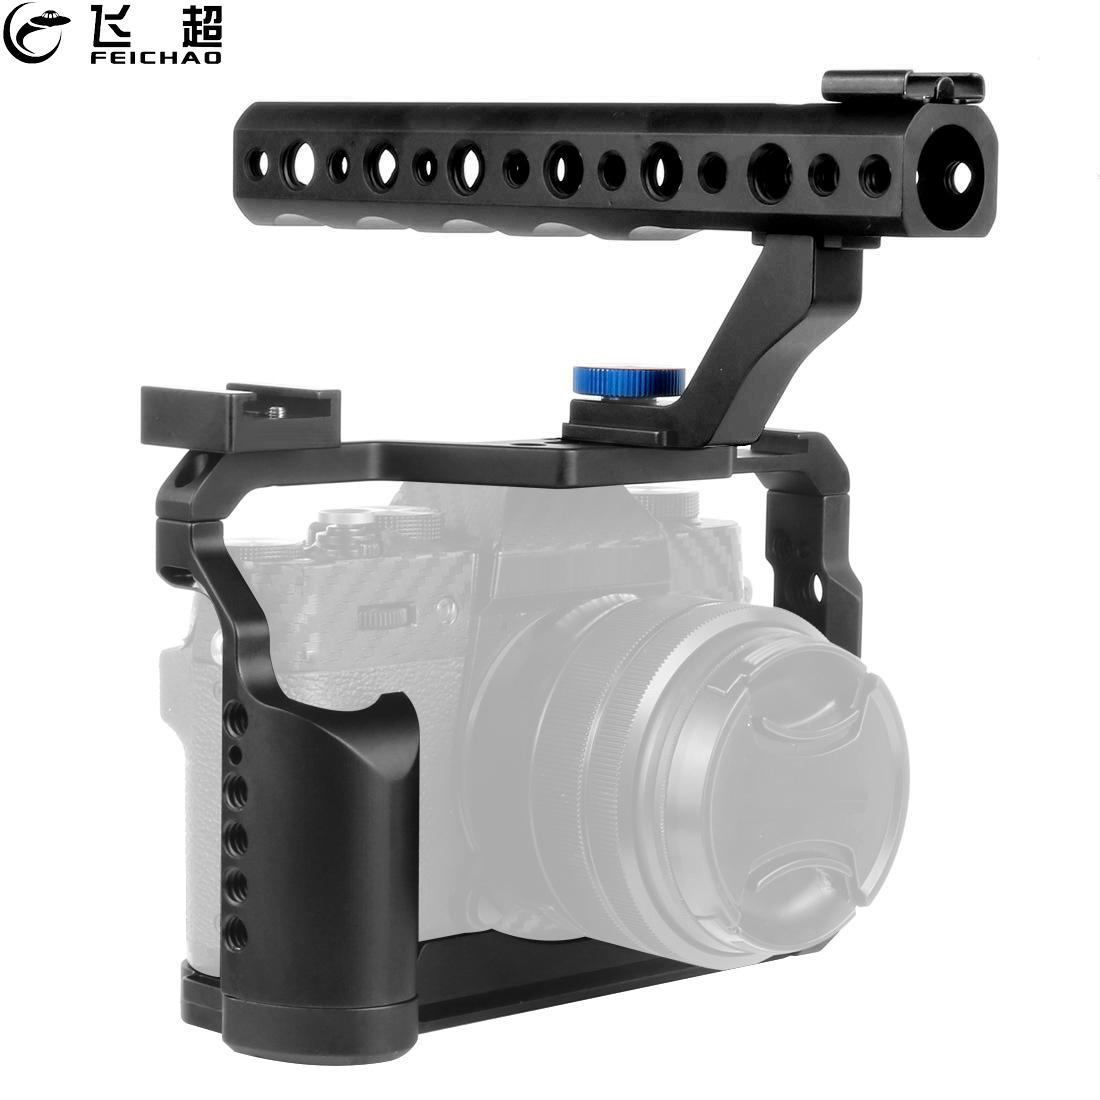 Držač držača za kavez za držanje gornjeg nosača cipele za DSLR - Kamera i foto